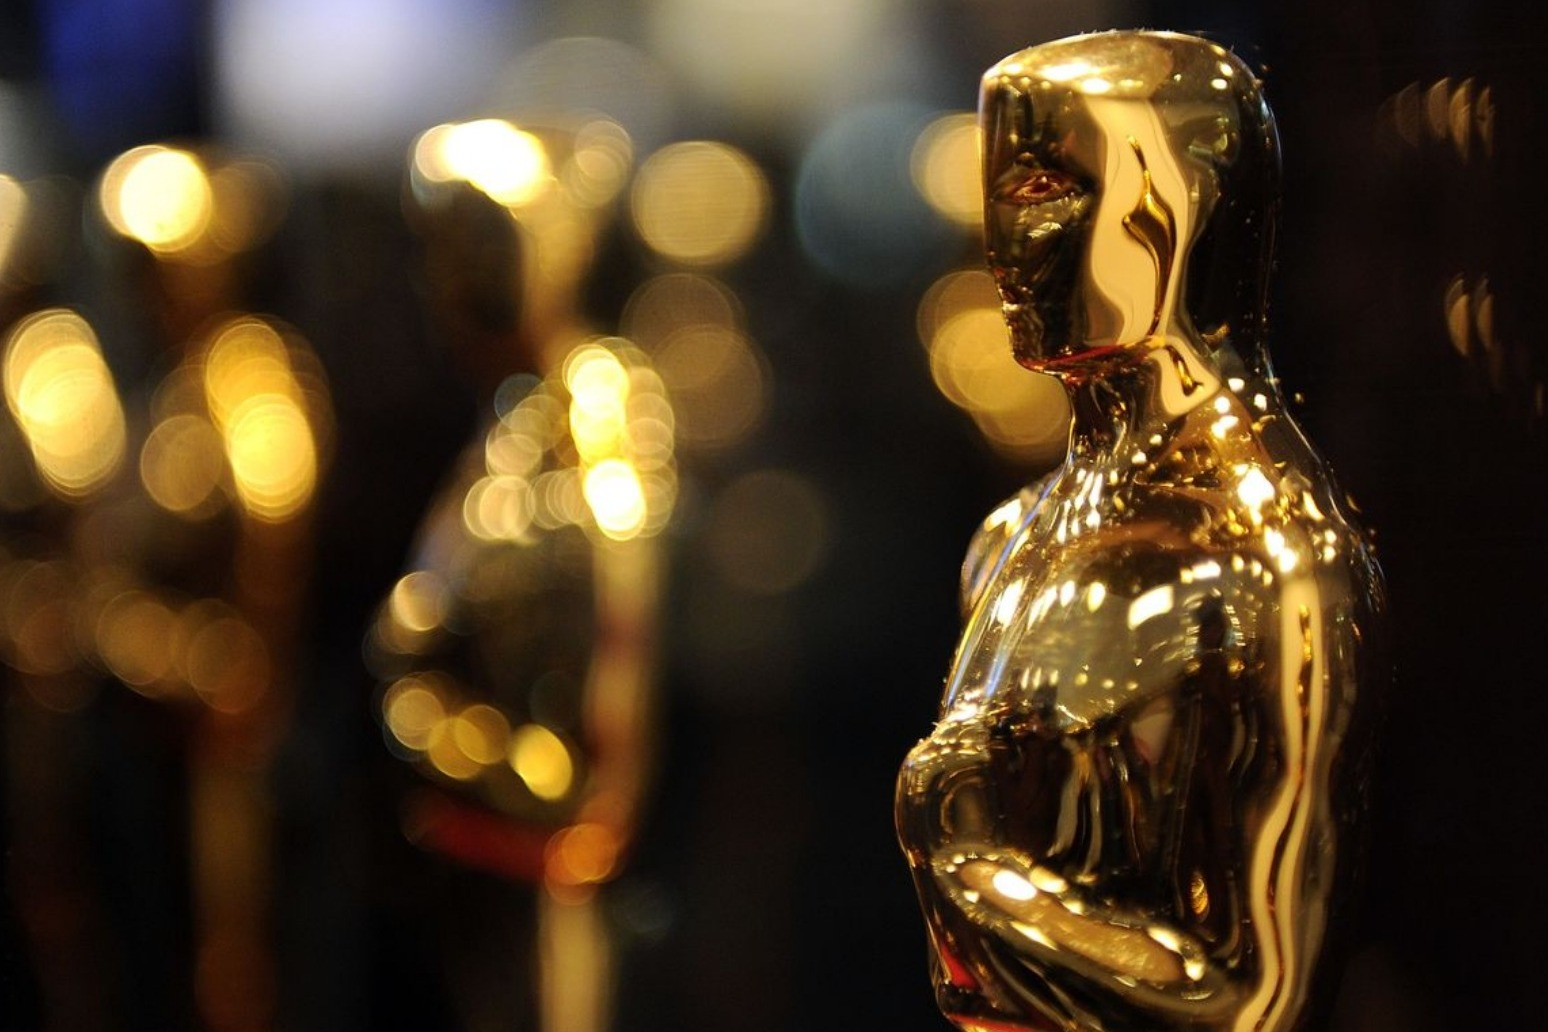 Olivia Colman wins best actress at the Oscars